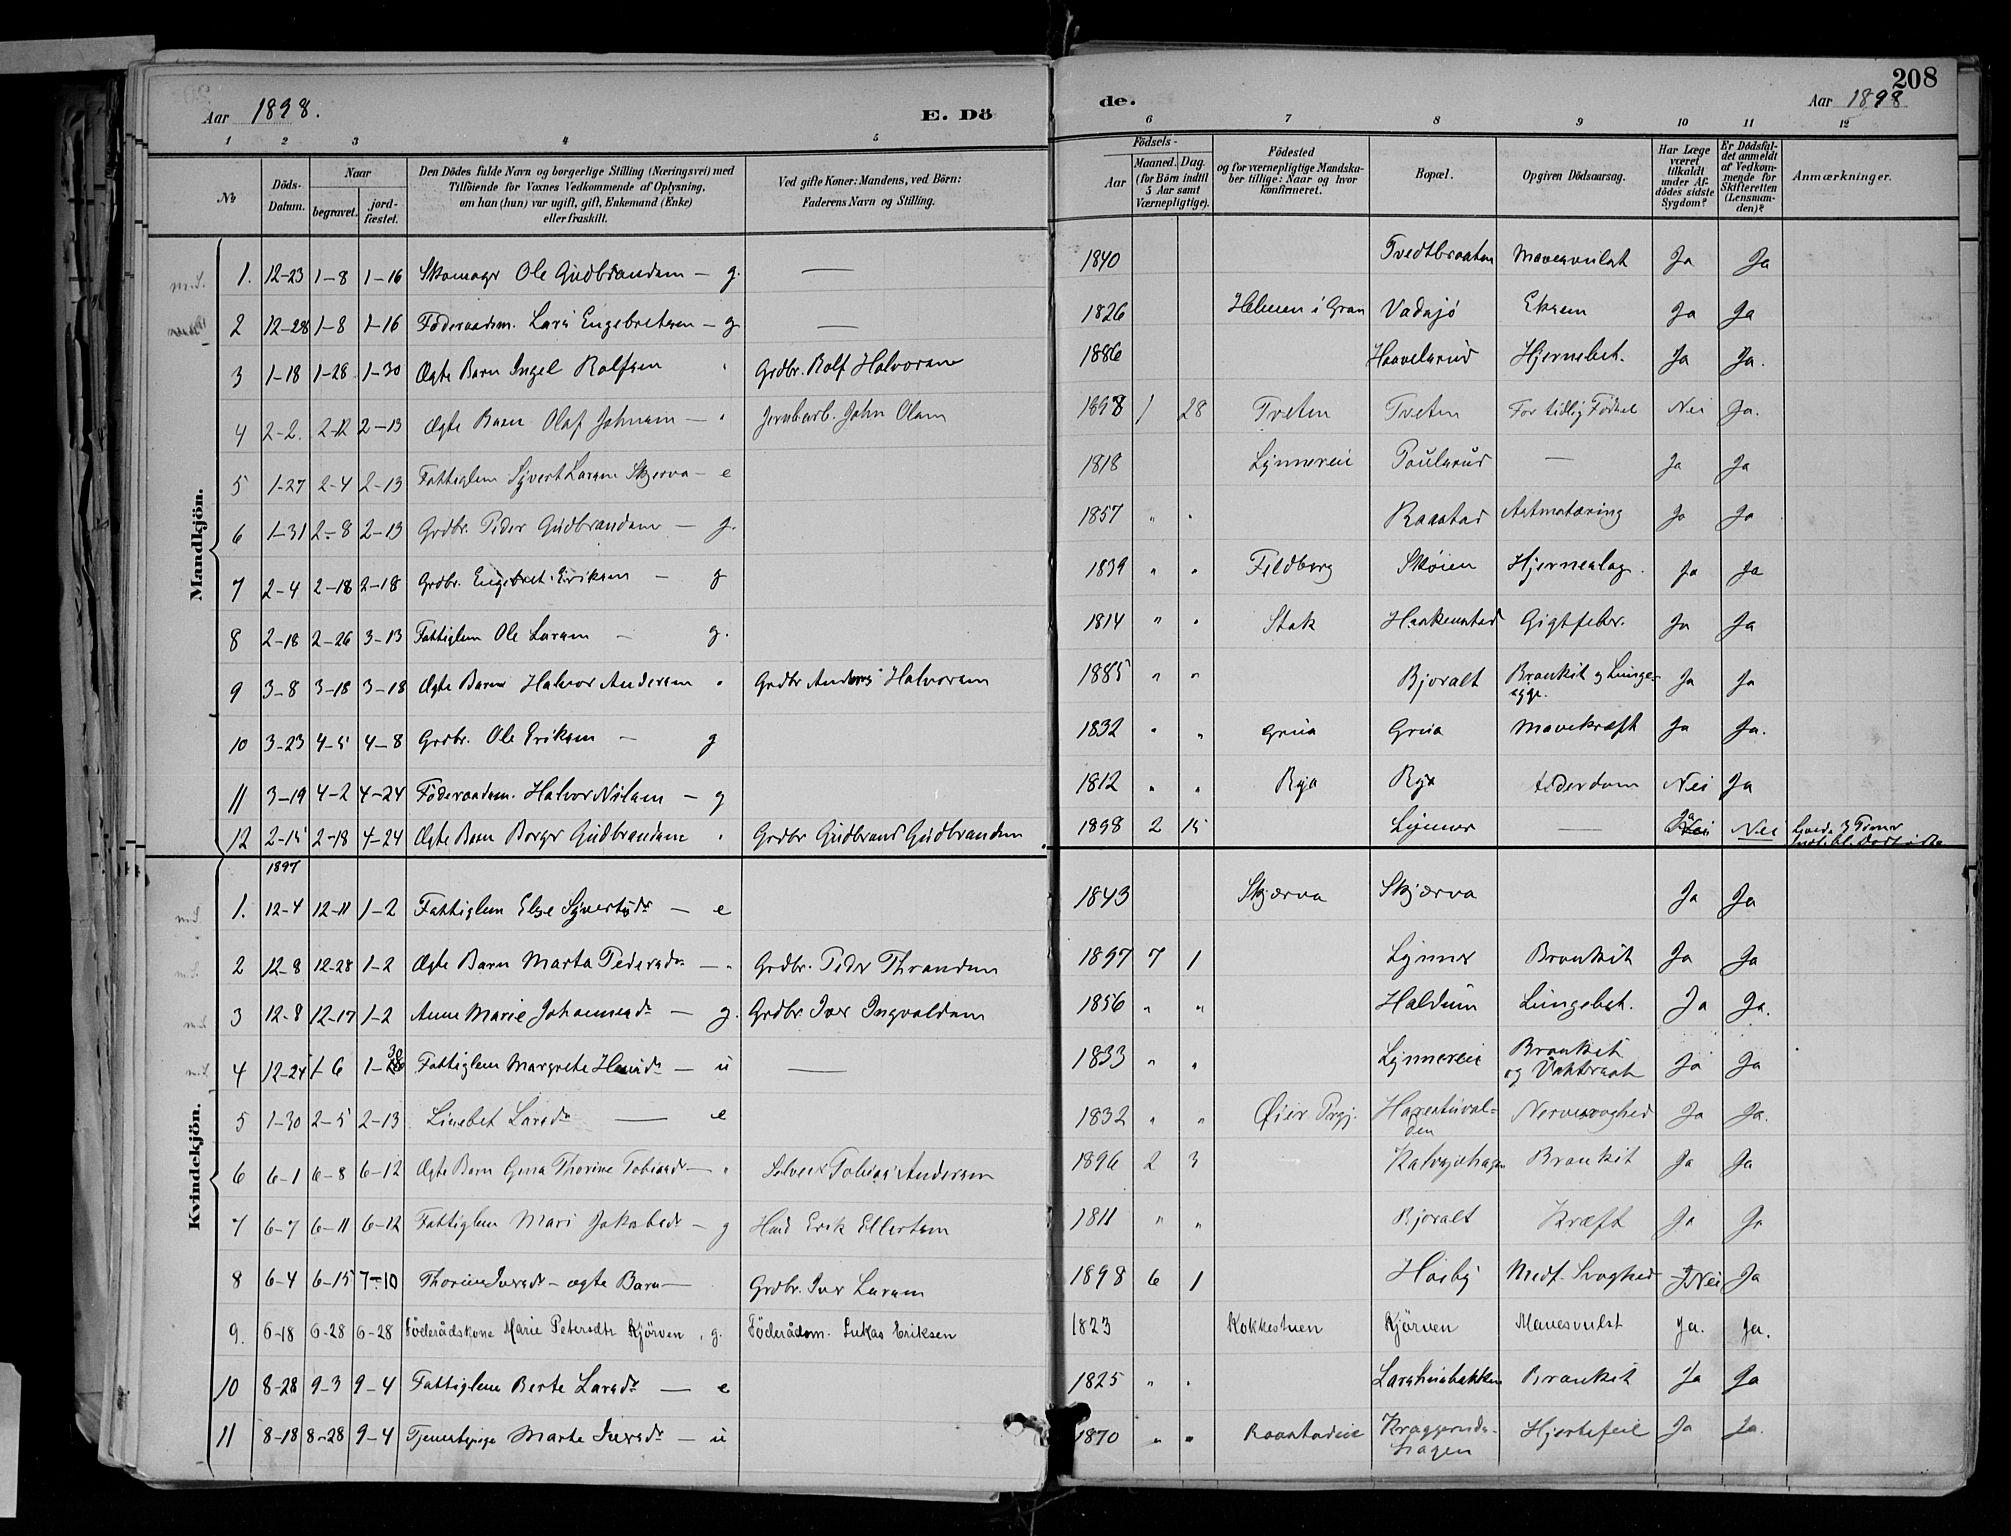 SAH, Jevnaker prestekontor, Ministerialbok nr. 10, 1891-1906, s. 208